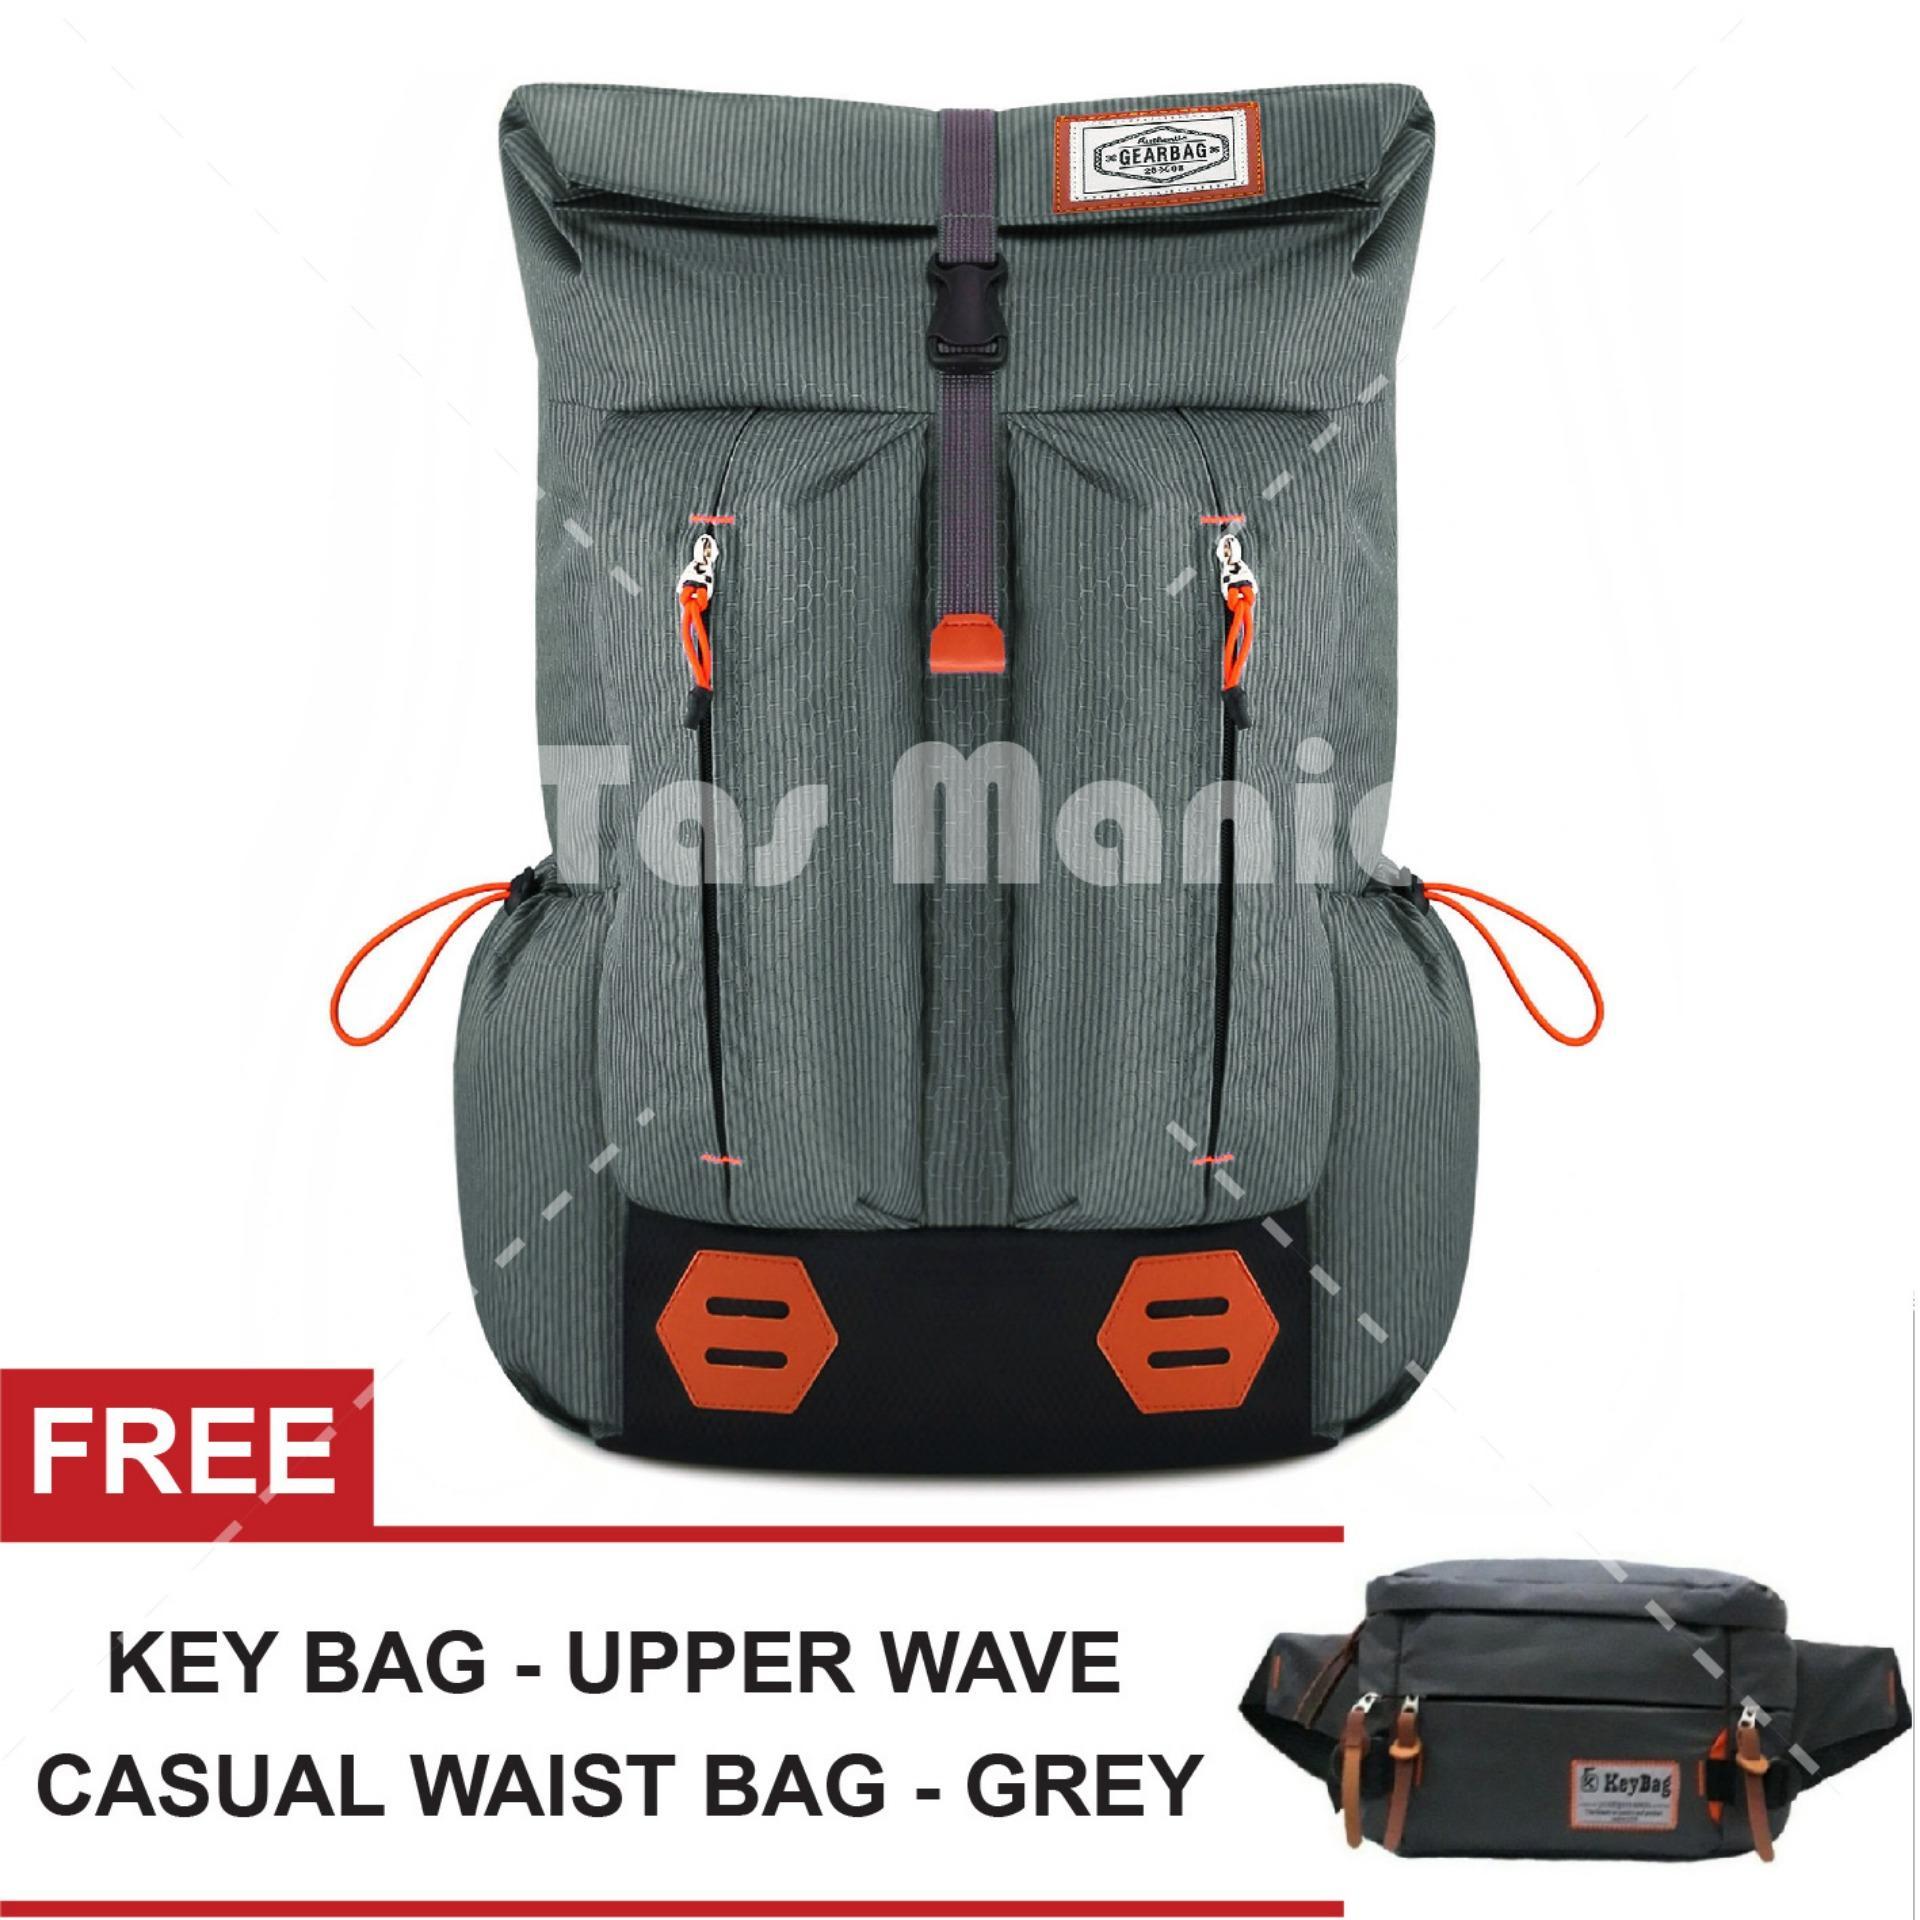 Tas Ransel Gear Bag Mount Everest - Adventure Tas Laptop Backpack - GREY JB + FREE Key Bag Upper Wave Casual Waist Bag Random Color Tas Pria Tas Gunung Tas Messenger Tas Slempang Tas Fashion Pria